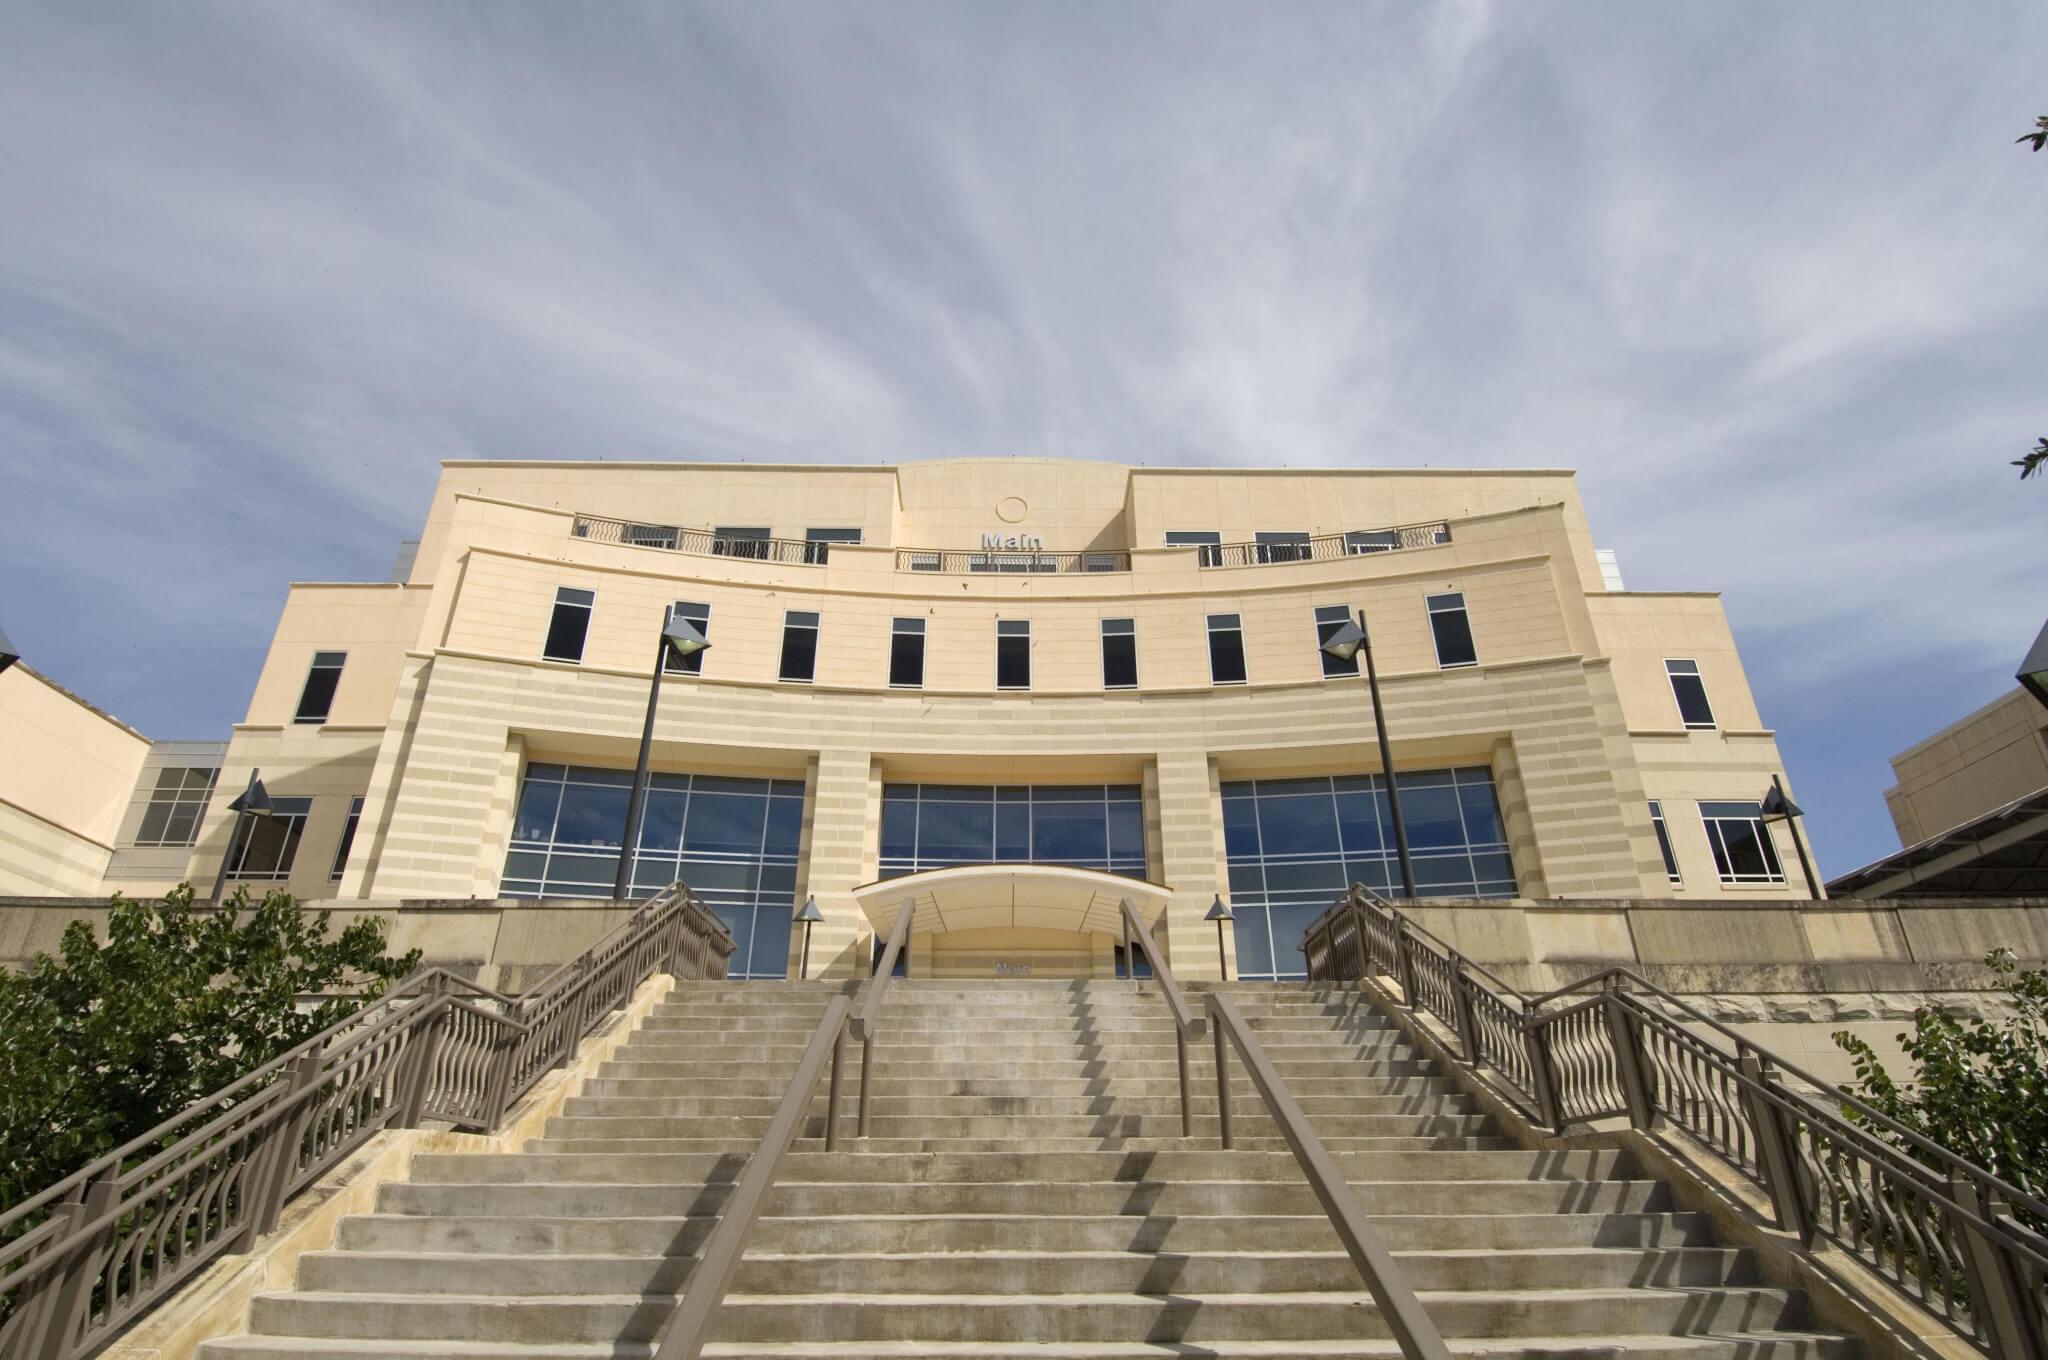 FGCU interim dean of Undergraduate Studies to take position as dean of University of Texas at San Antonio Honors College